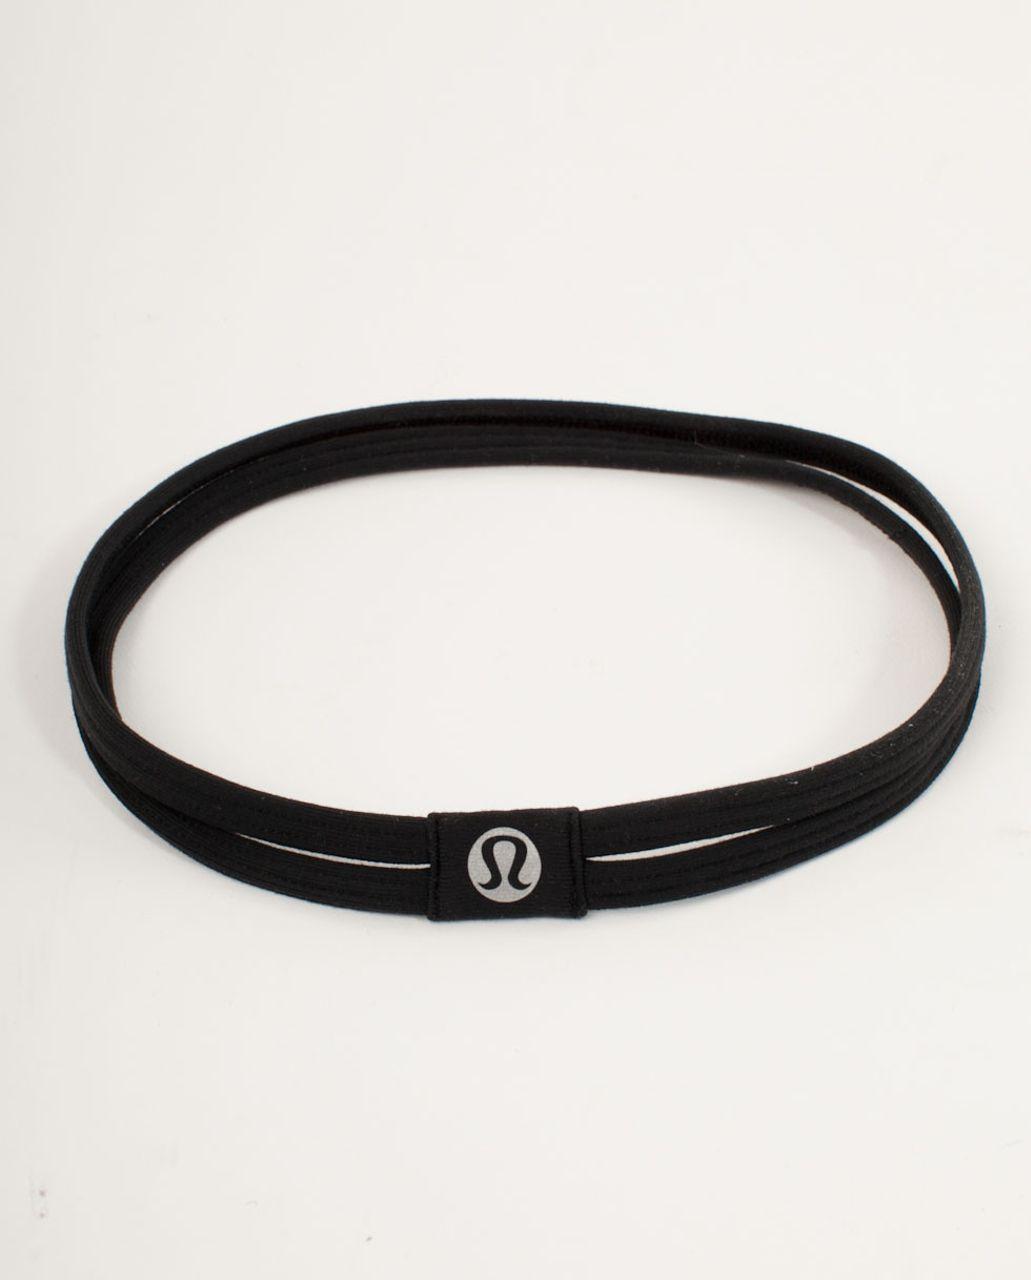 Lululemon DANCE! Headband - Black